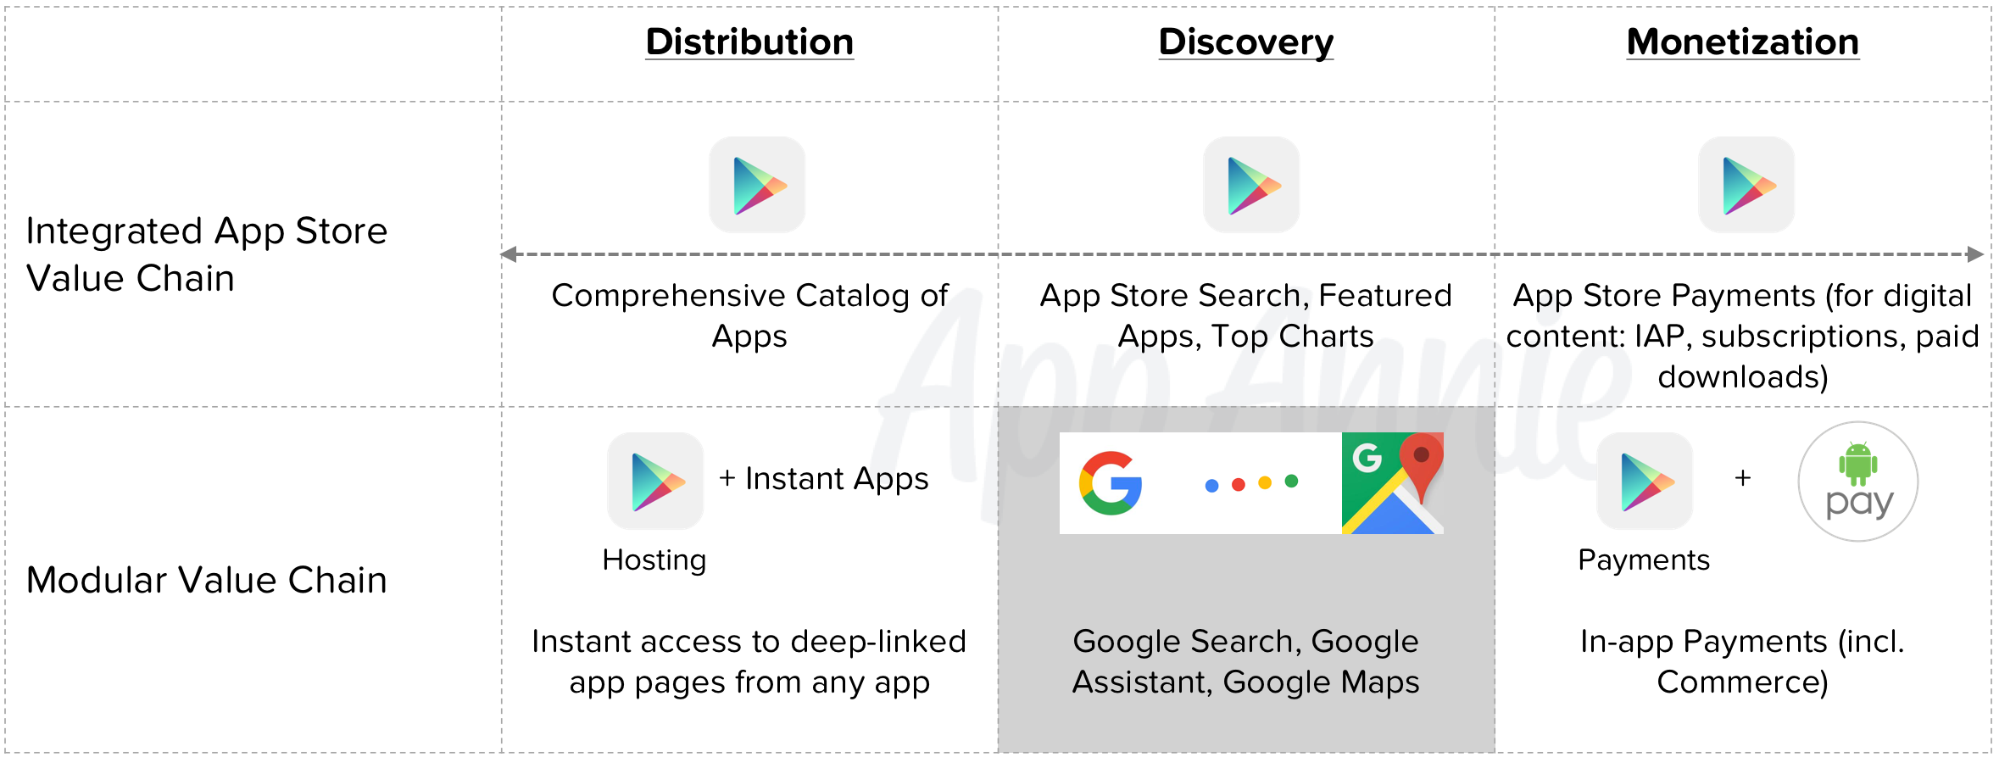 app-distribution-discovery-monetization